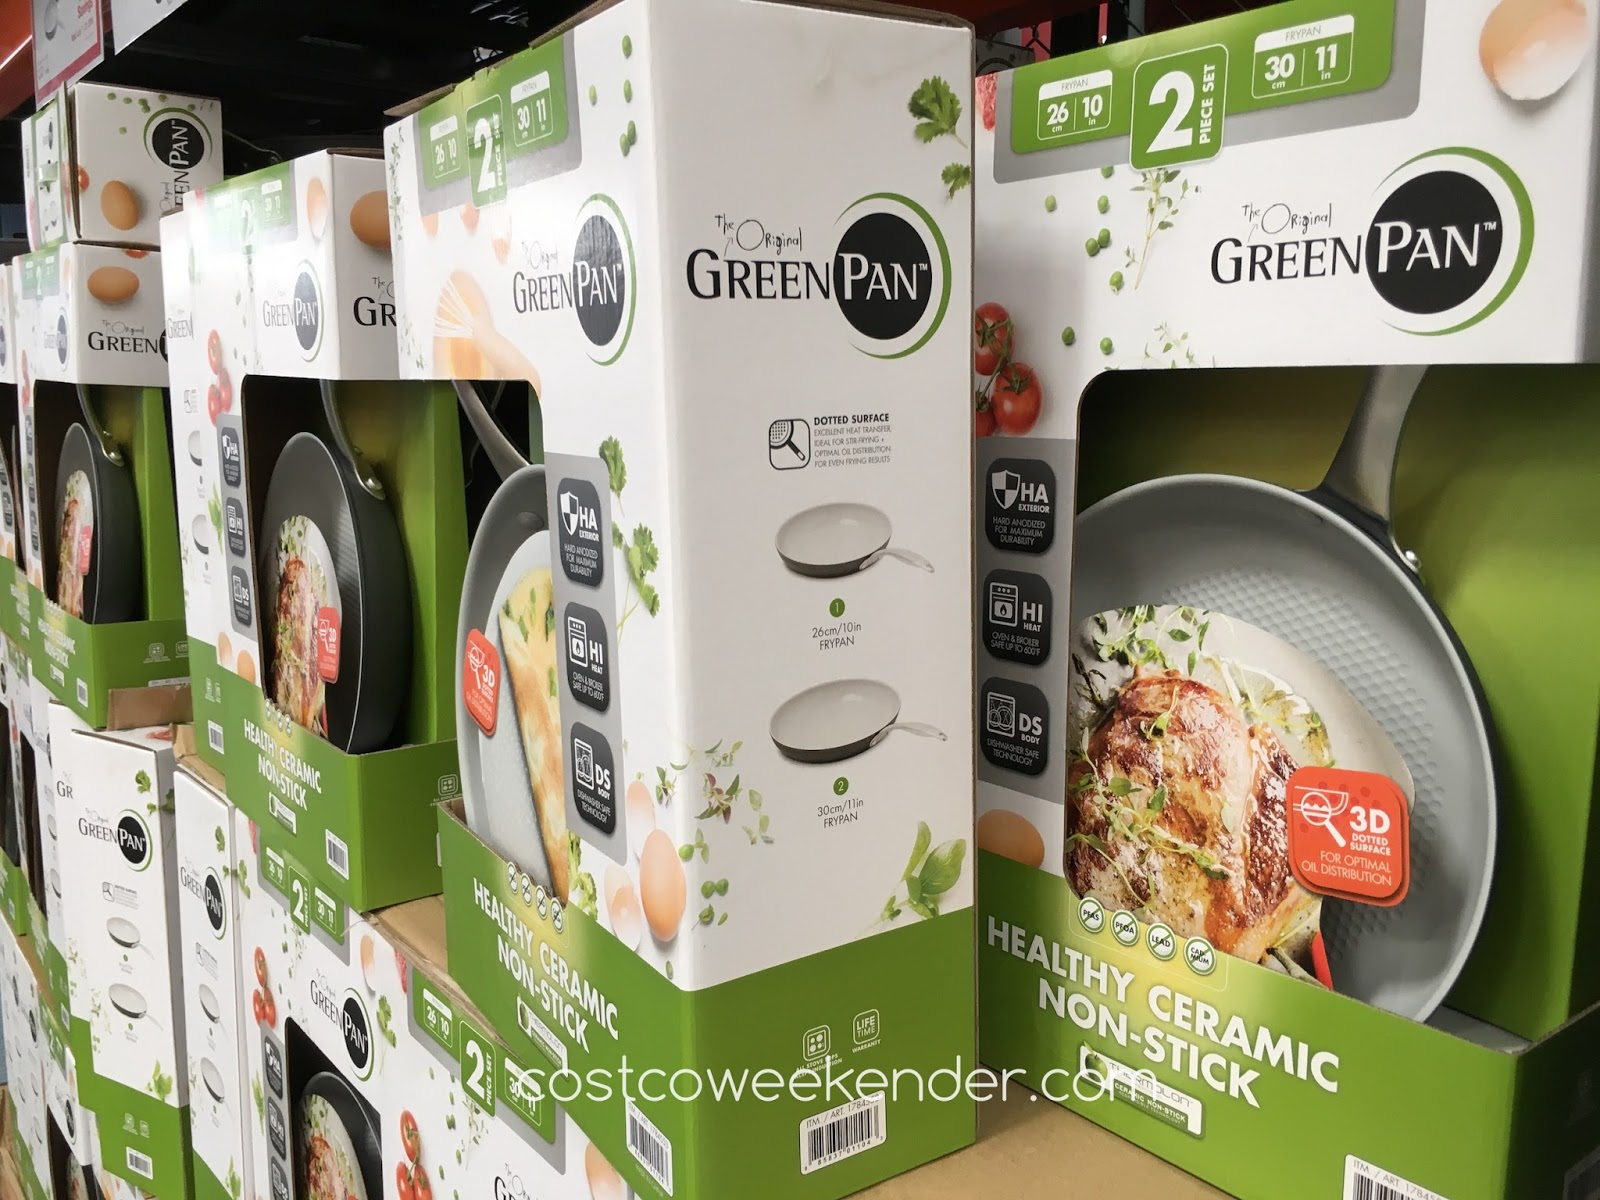 green pan healthy ceramic non stick skillets 2 piece set